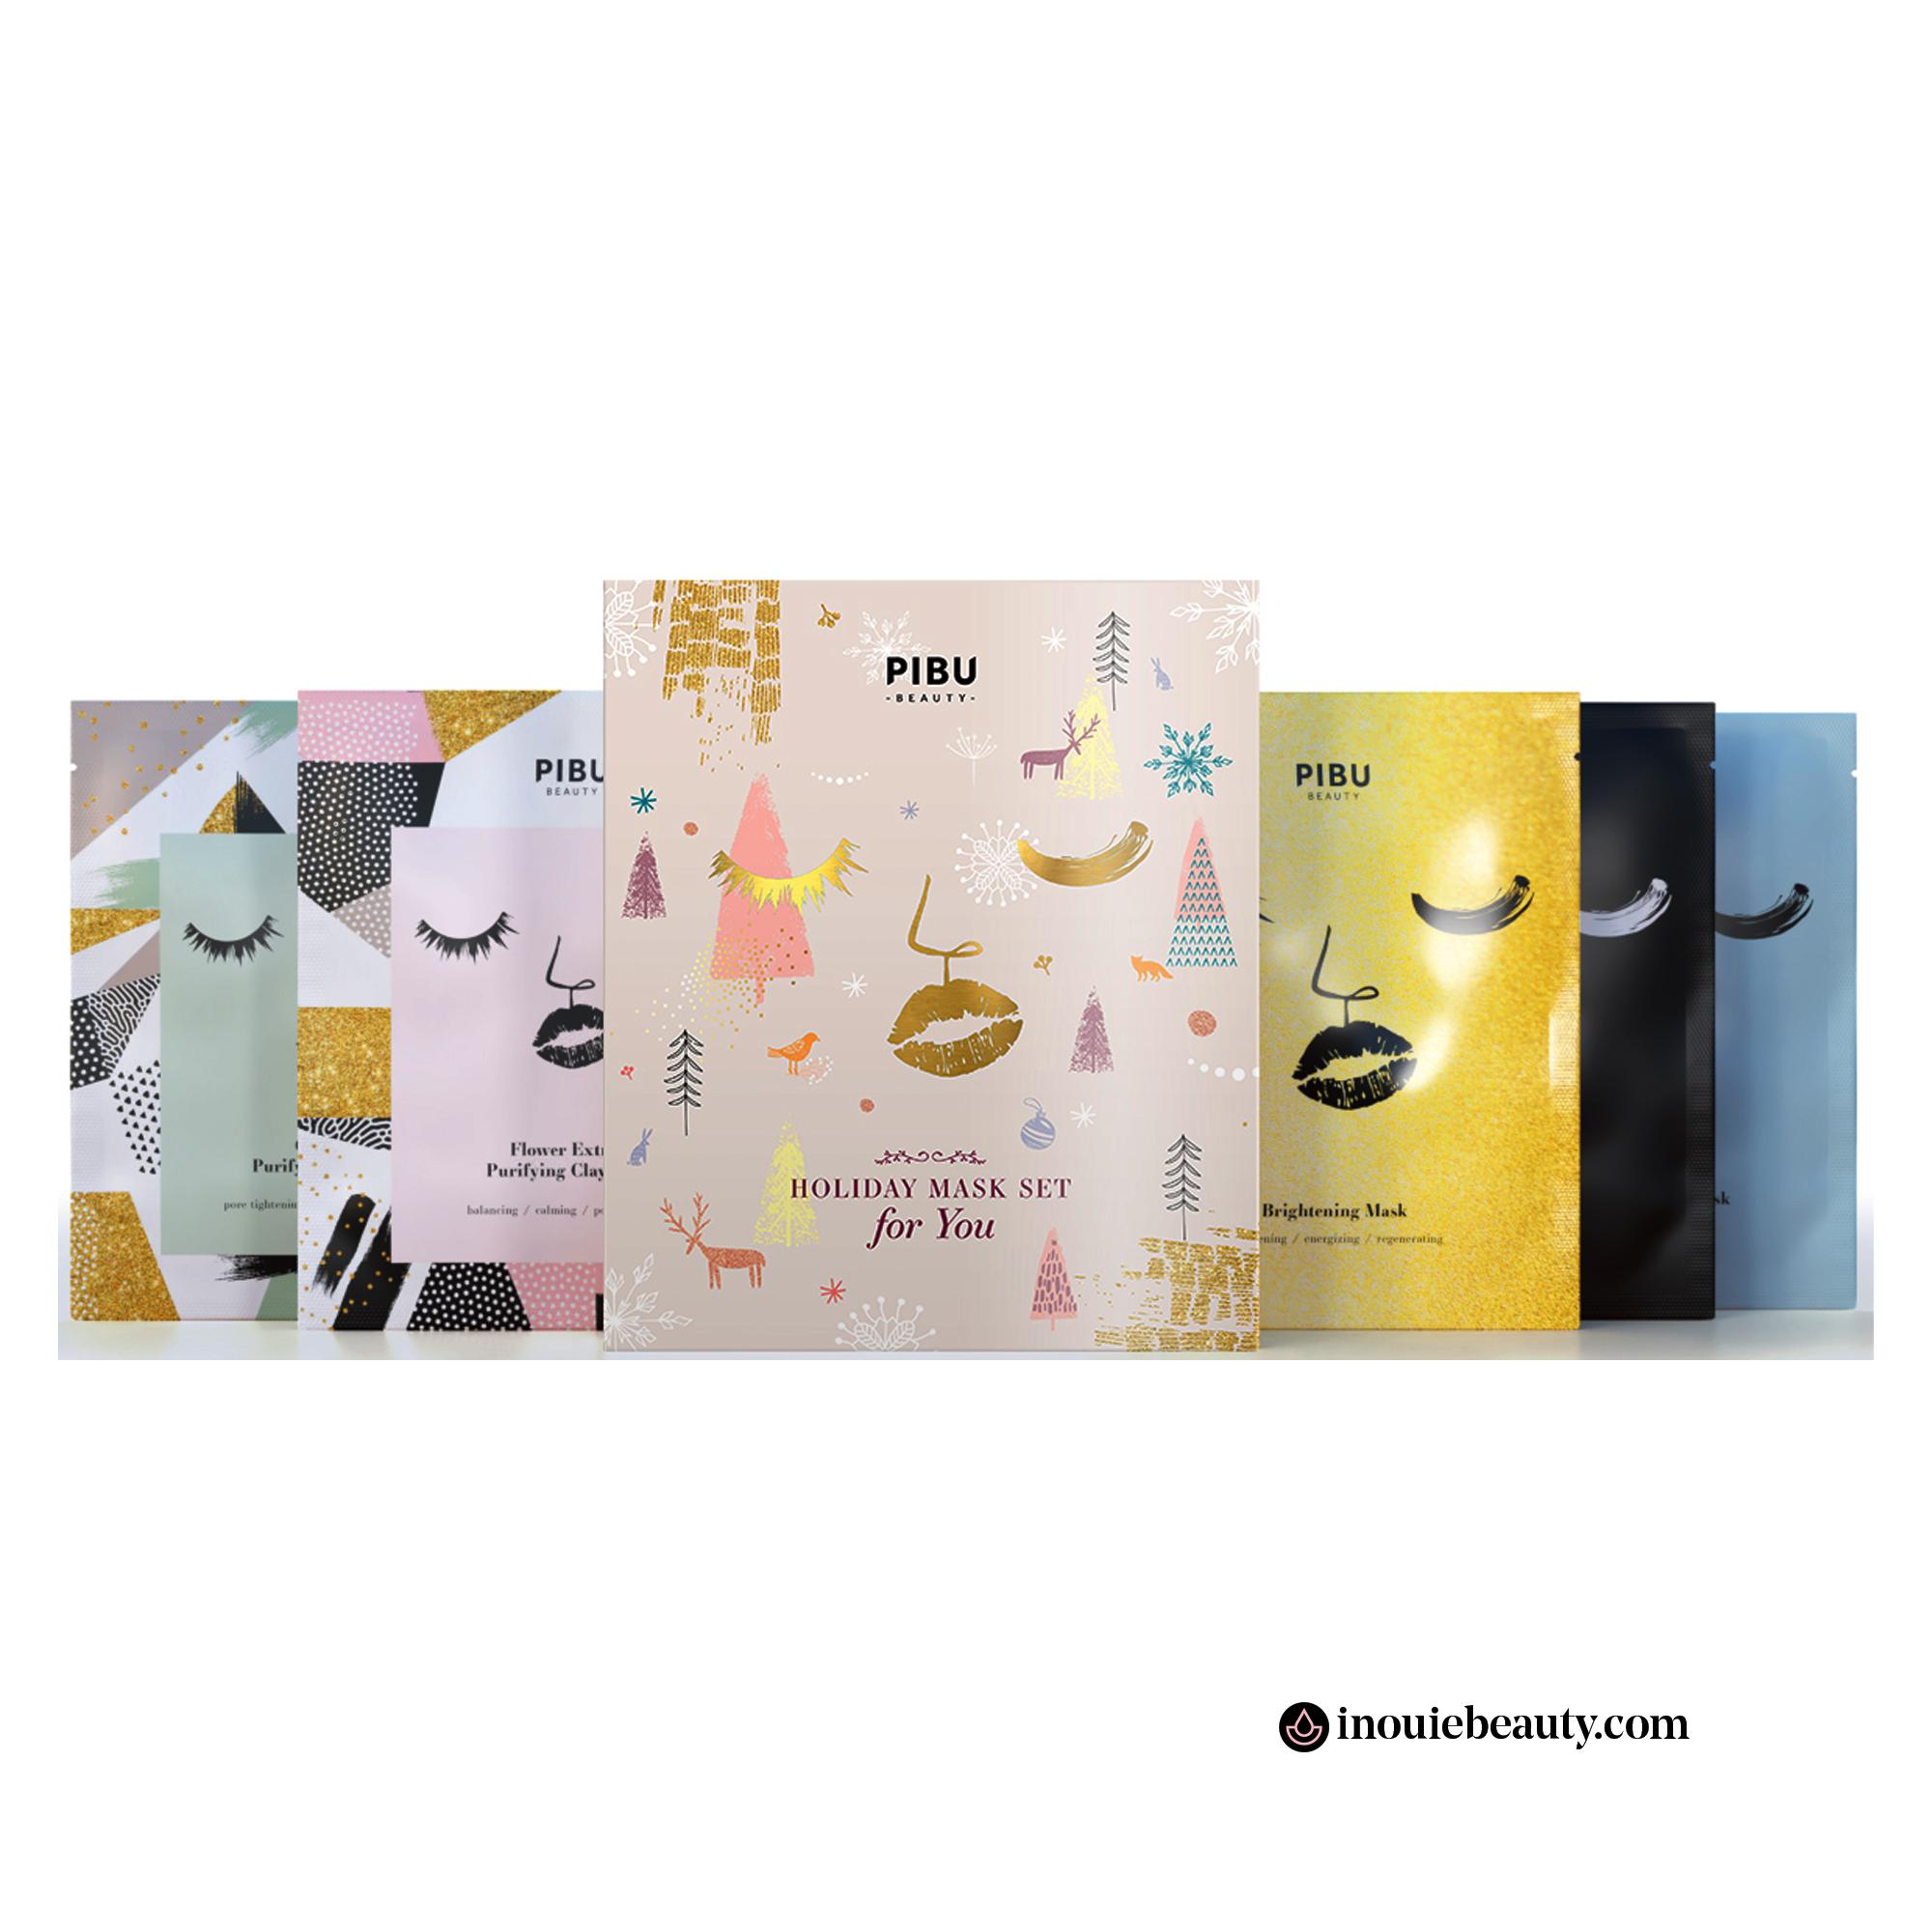 Pibu Holiday Mask Set